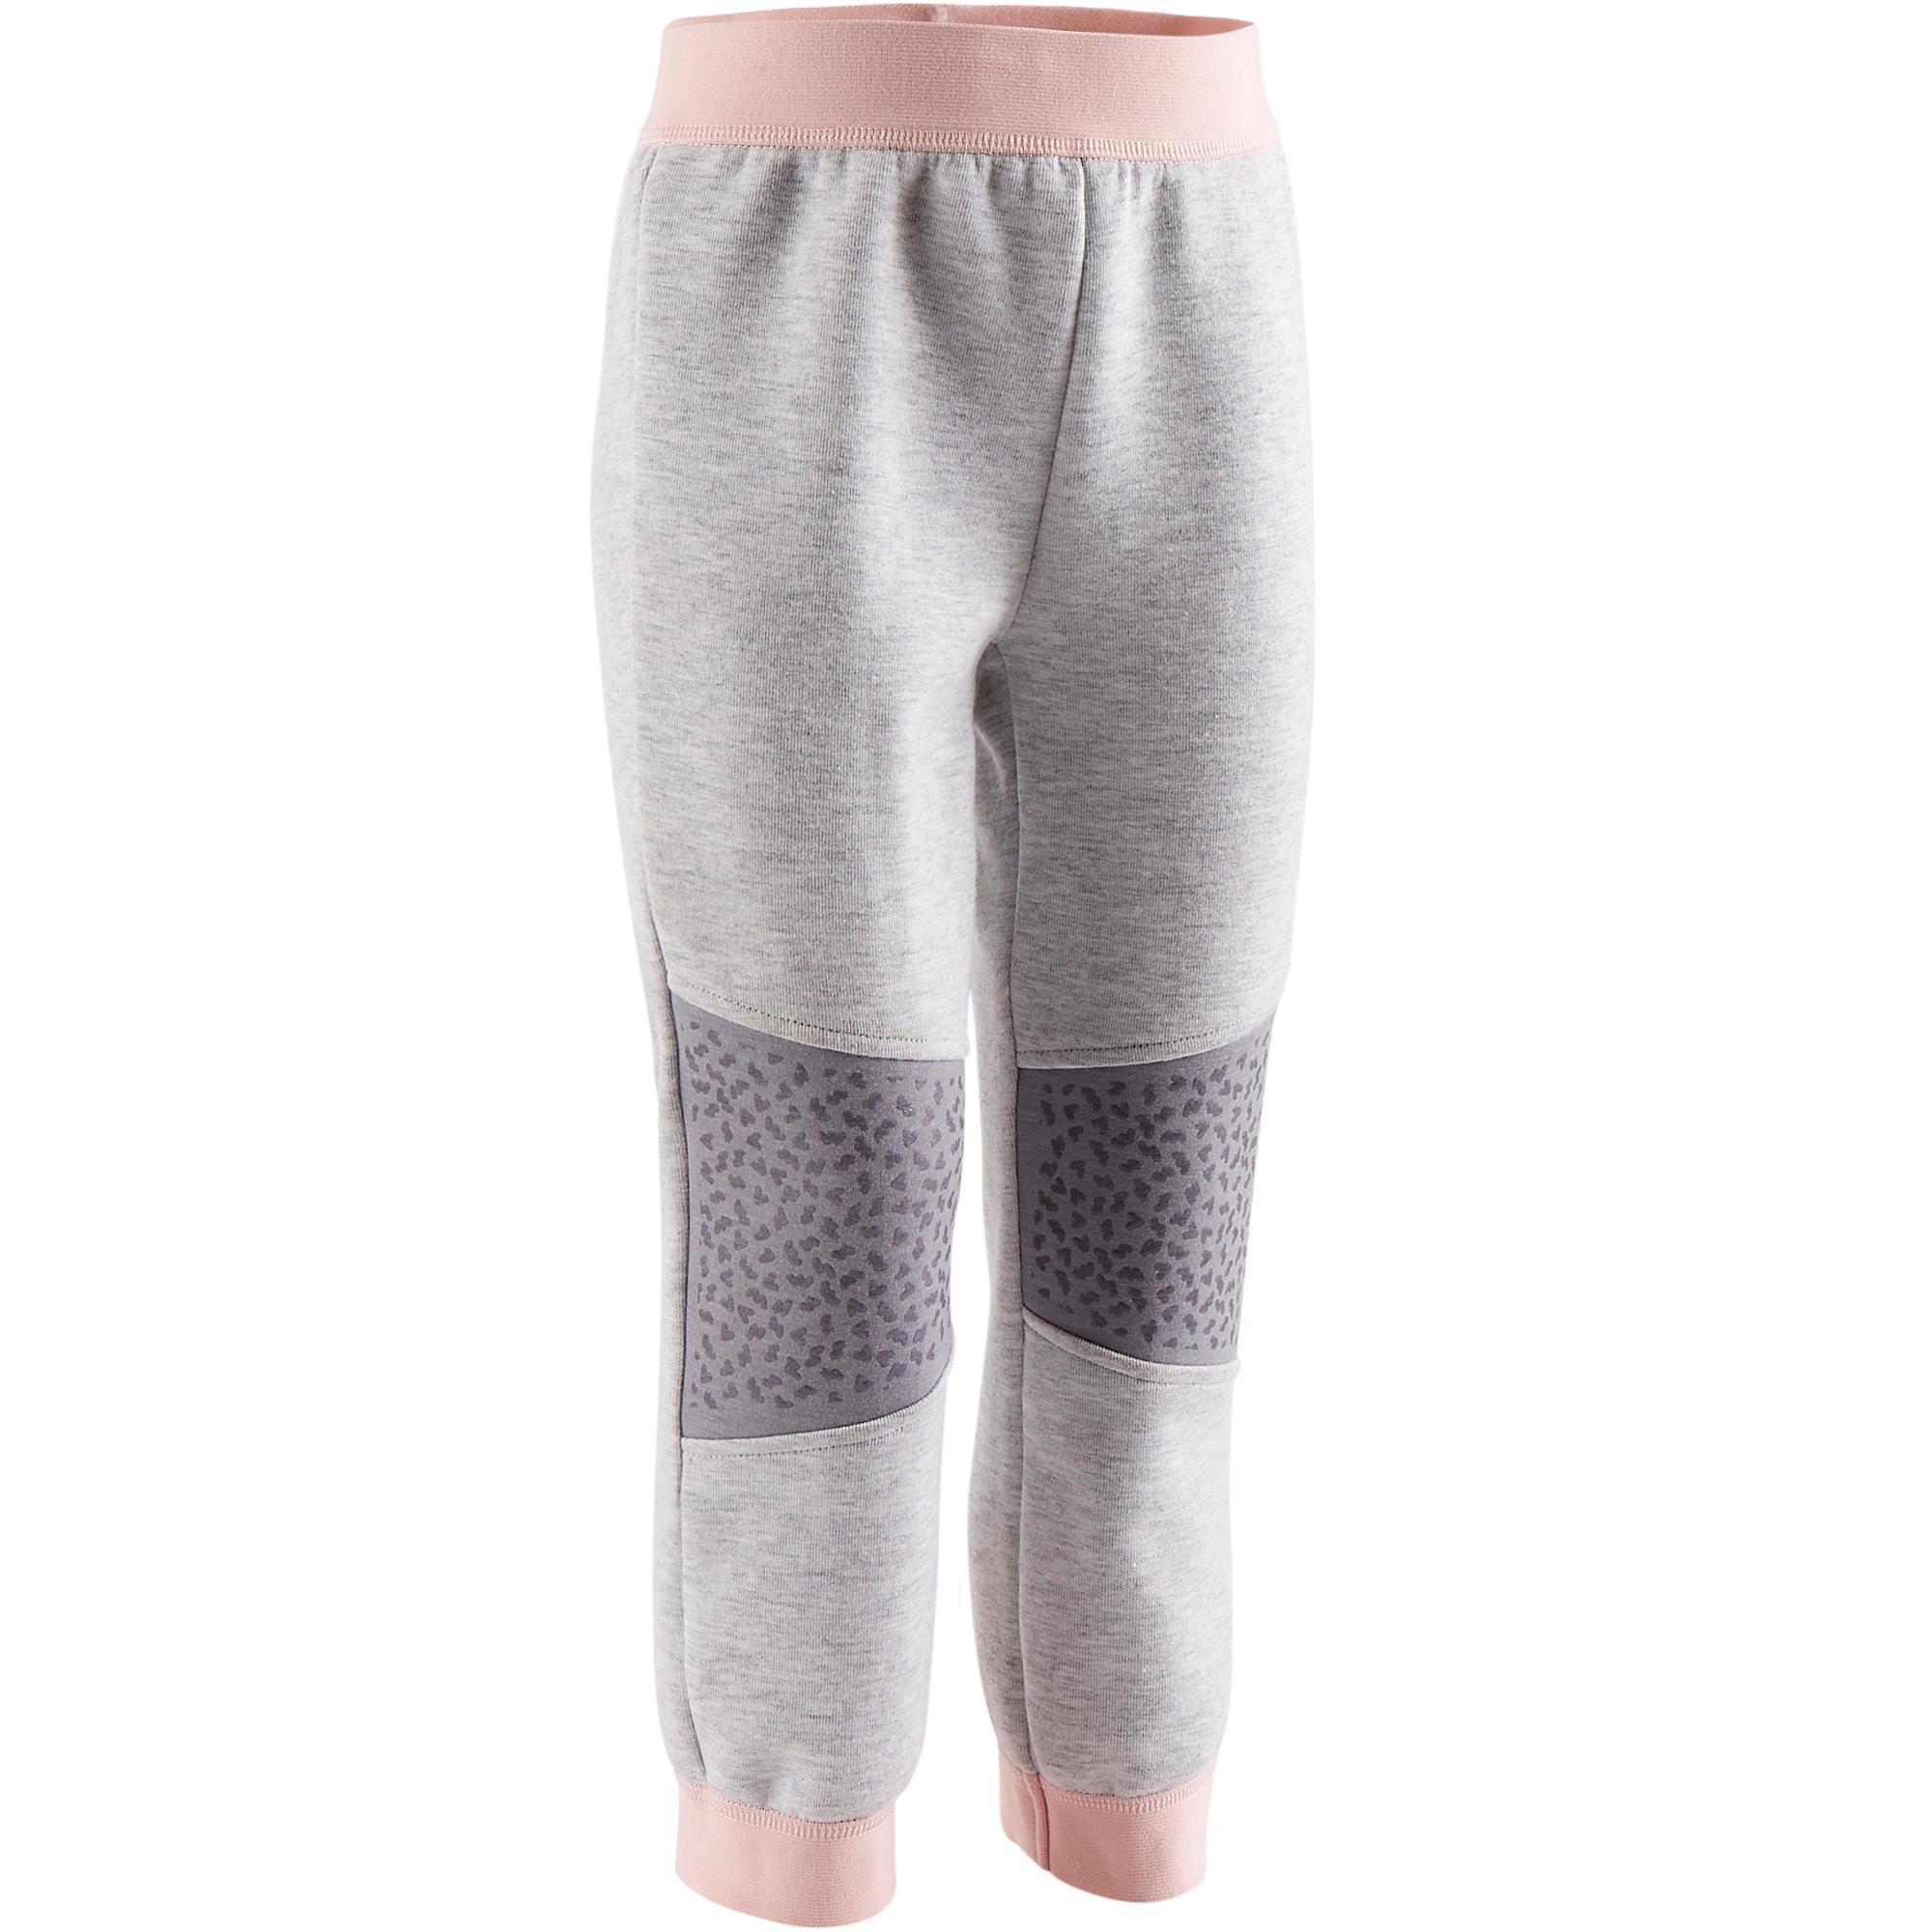 Pantalon baby gym 500 grisrose domyos